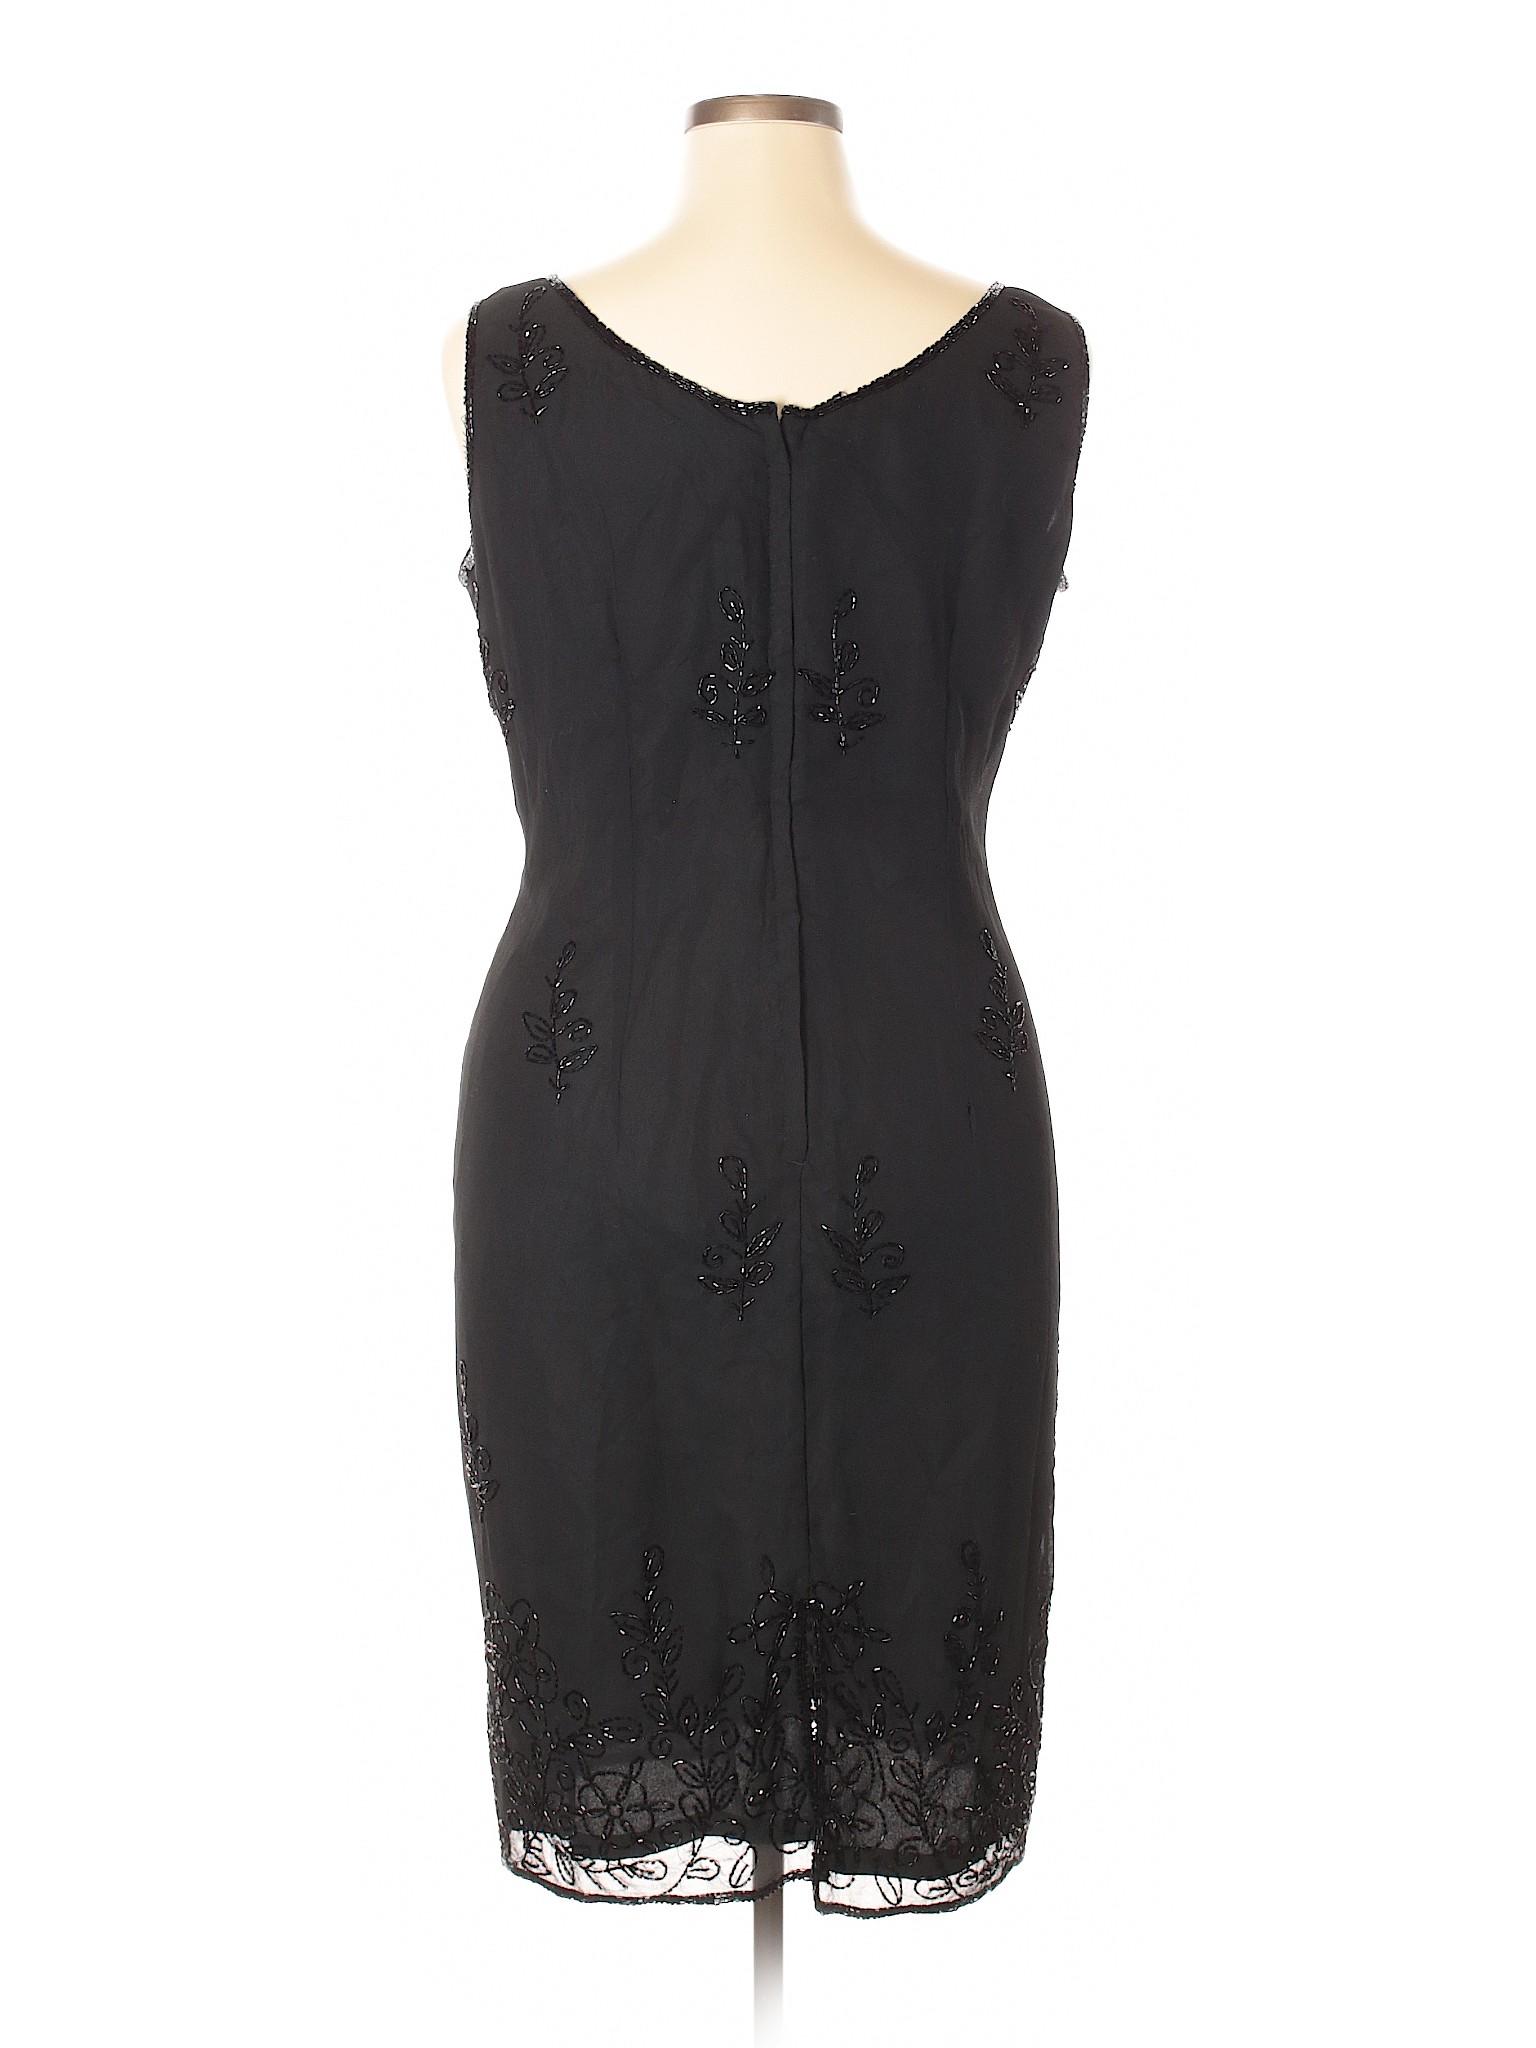 JMD Casual winter Boutique Dress York New vzZHnwx5q